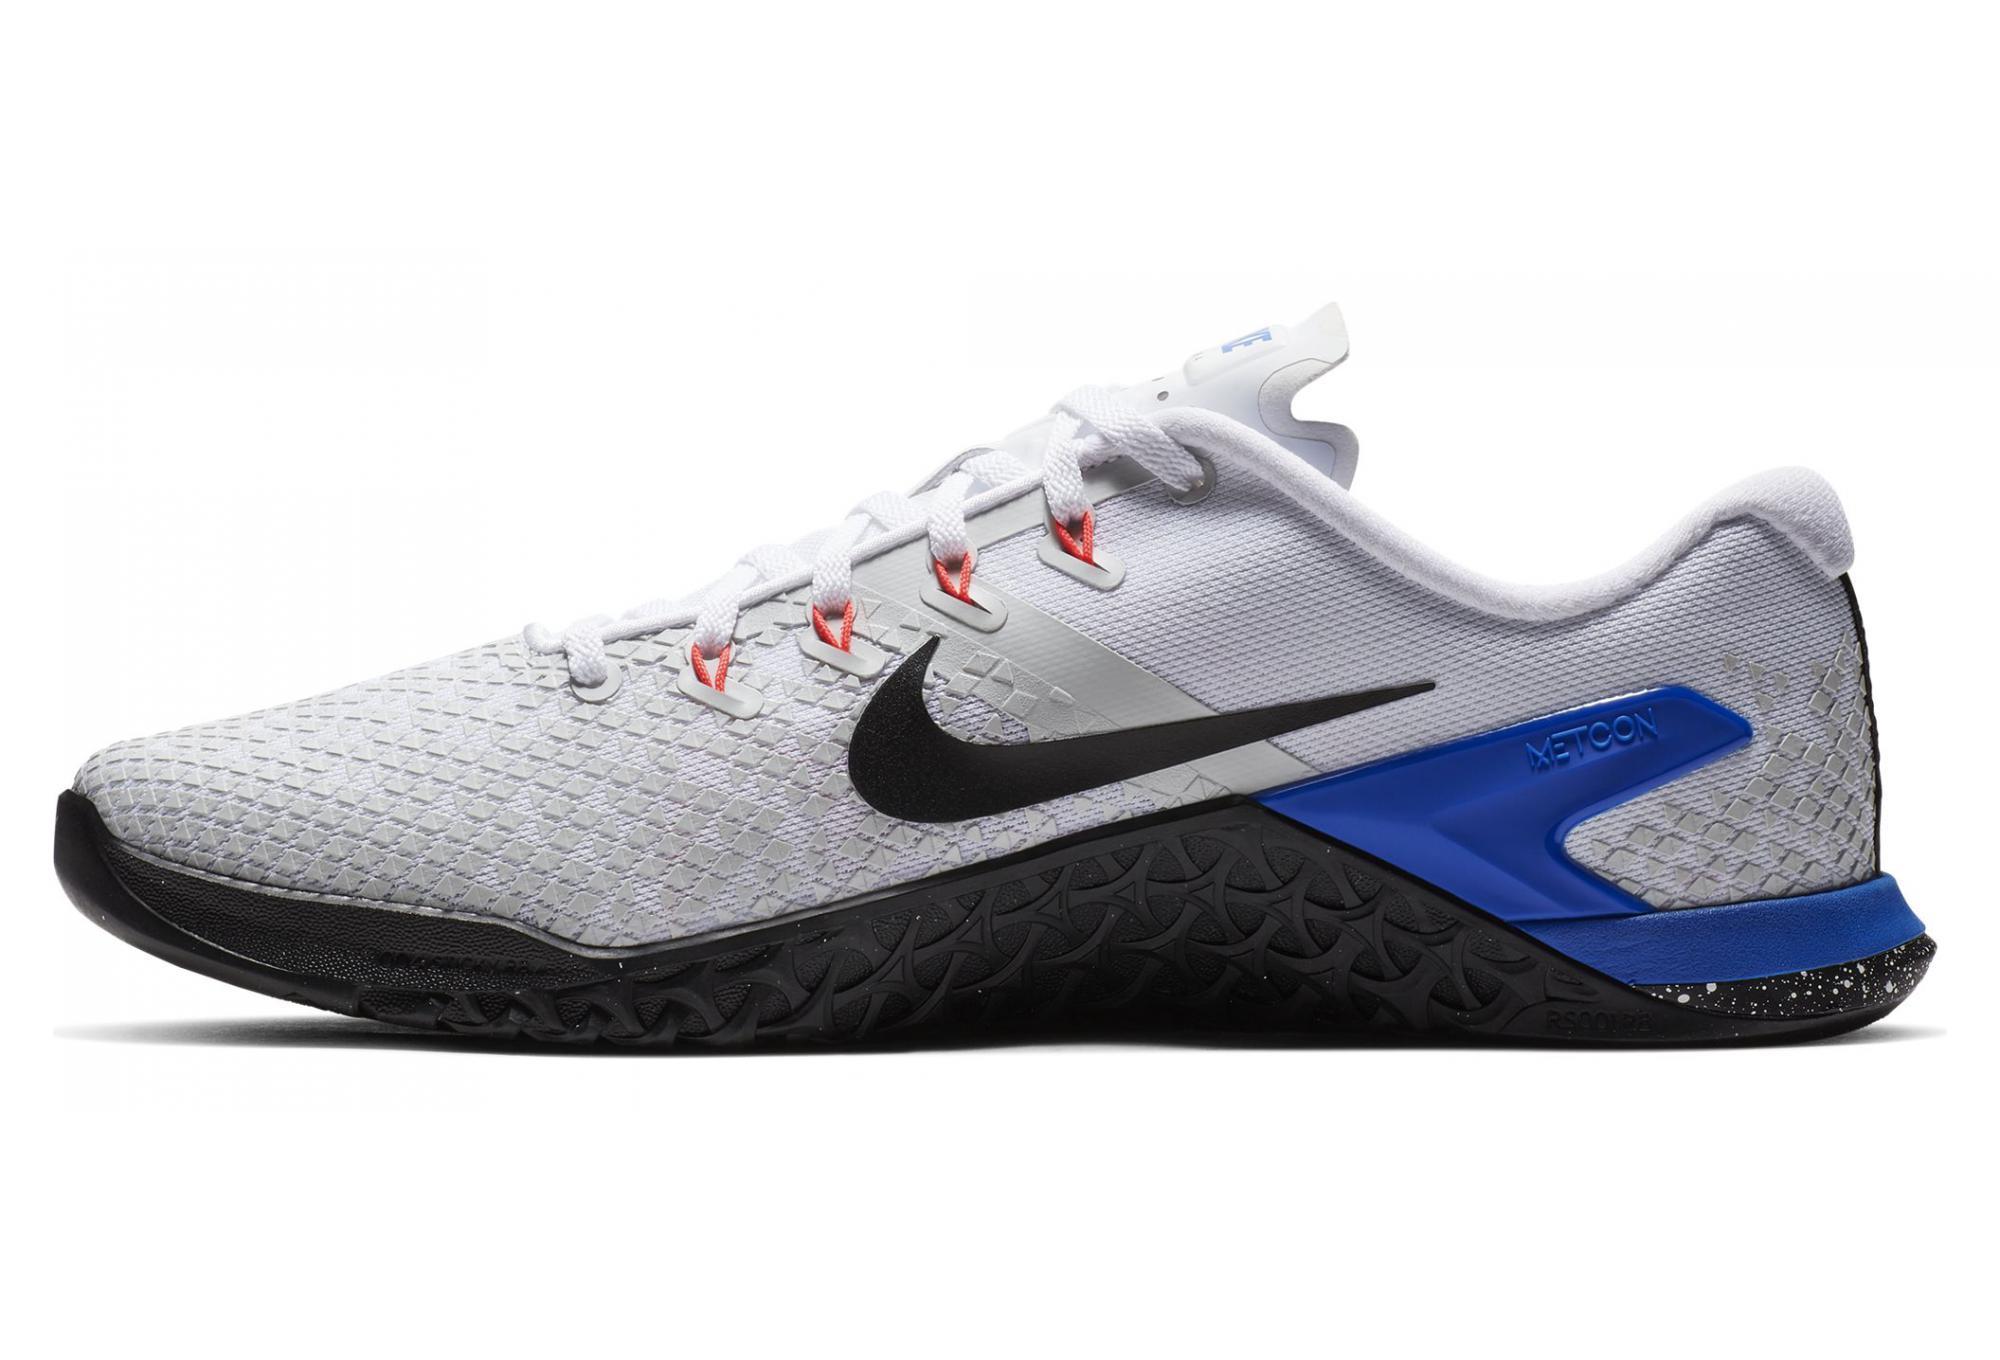 bfd126e60 Zapatillas Nike Metcon 4 XD para Hombre Blanco / Negro